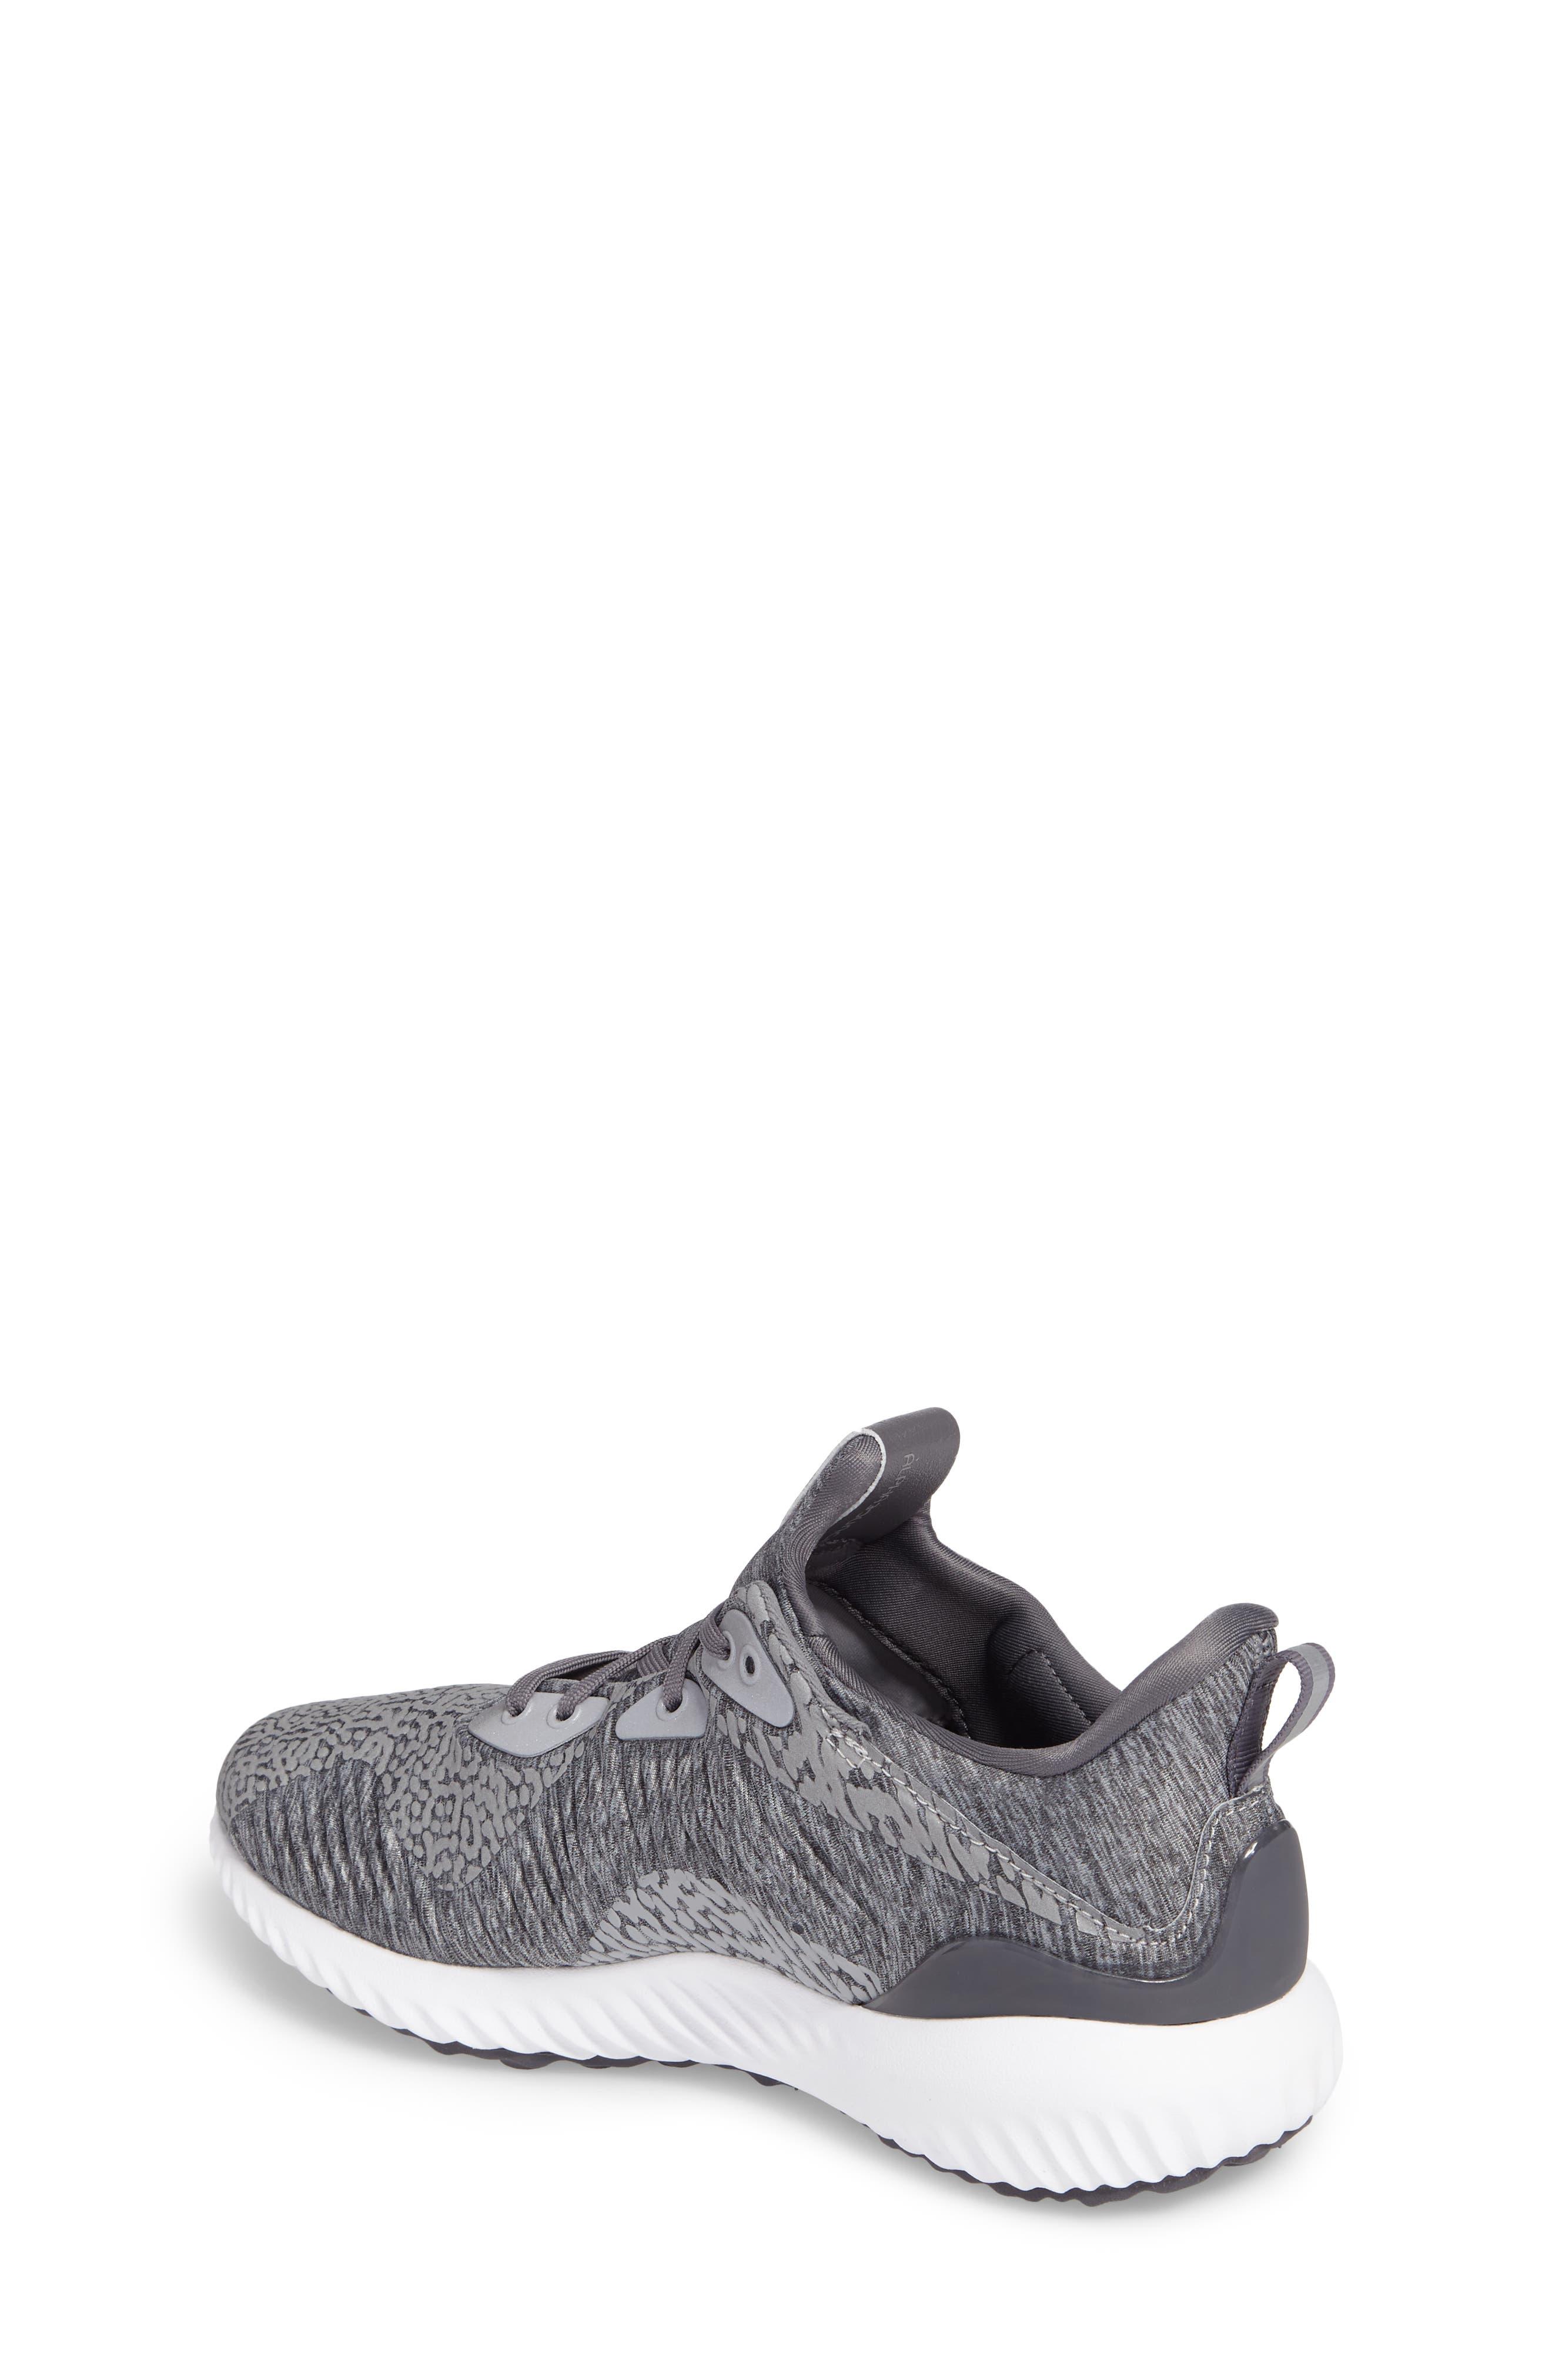 AlphaBounce Sneaker,                             Alternate thumbnail 2, color,                             035